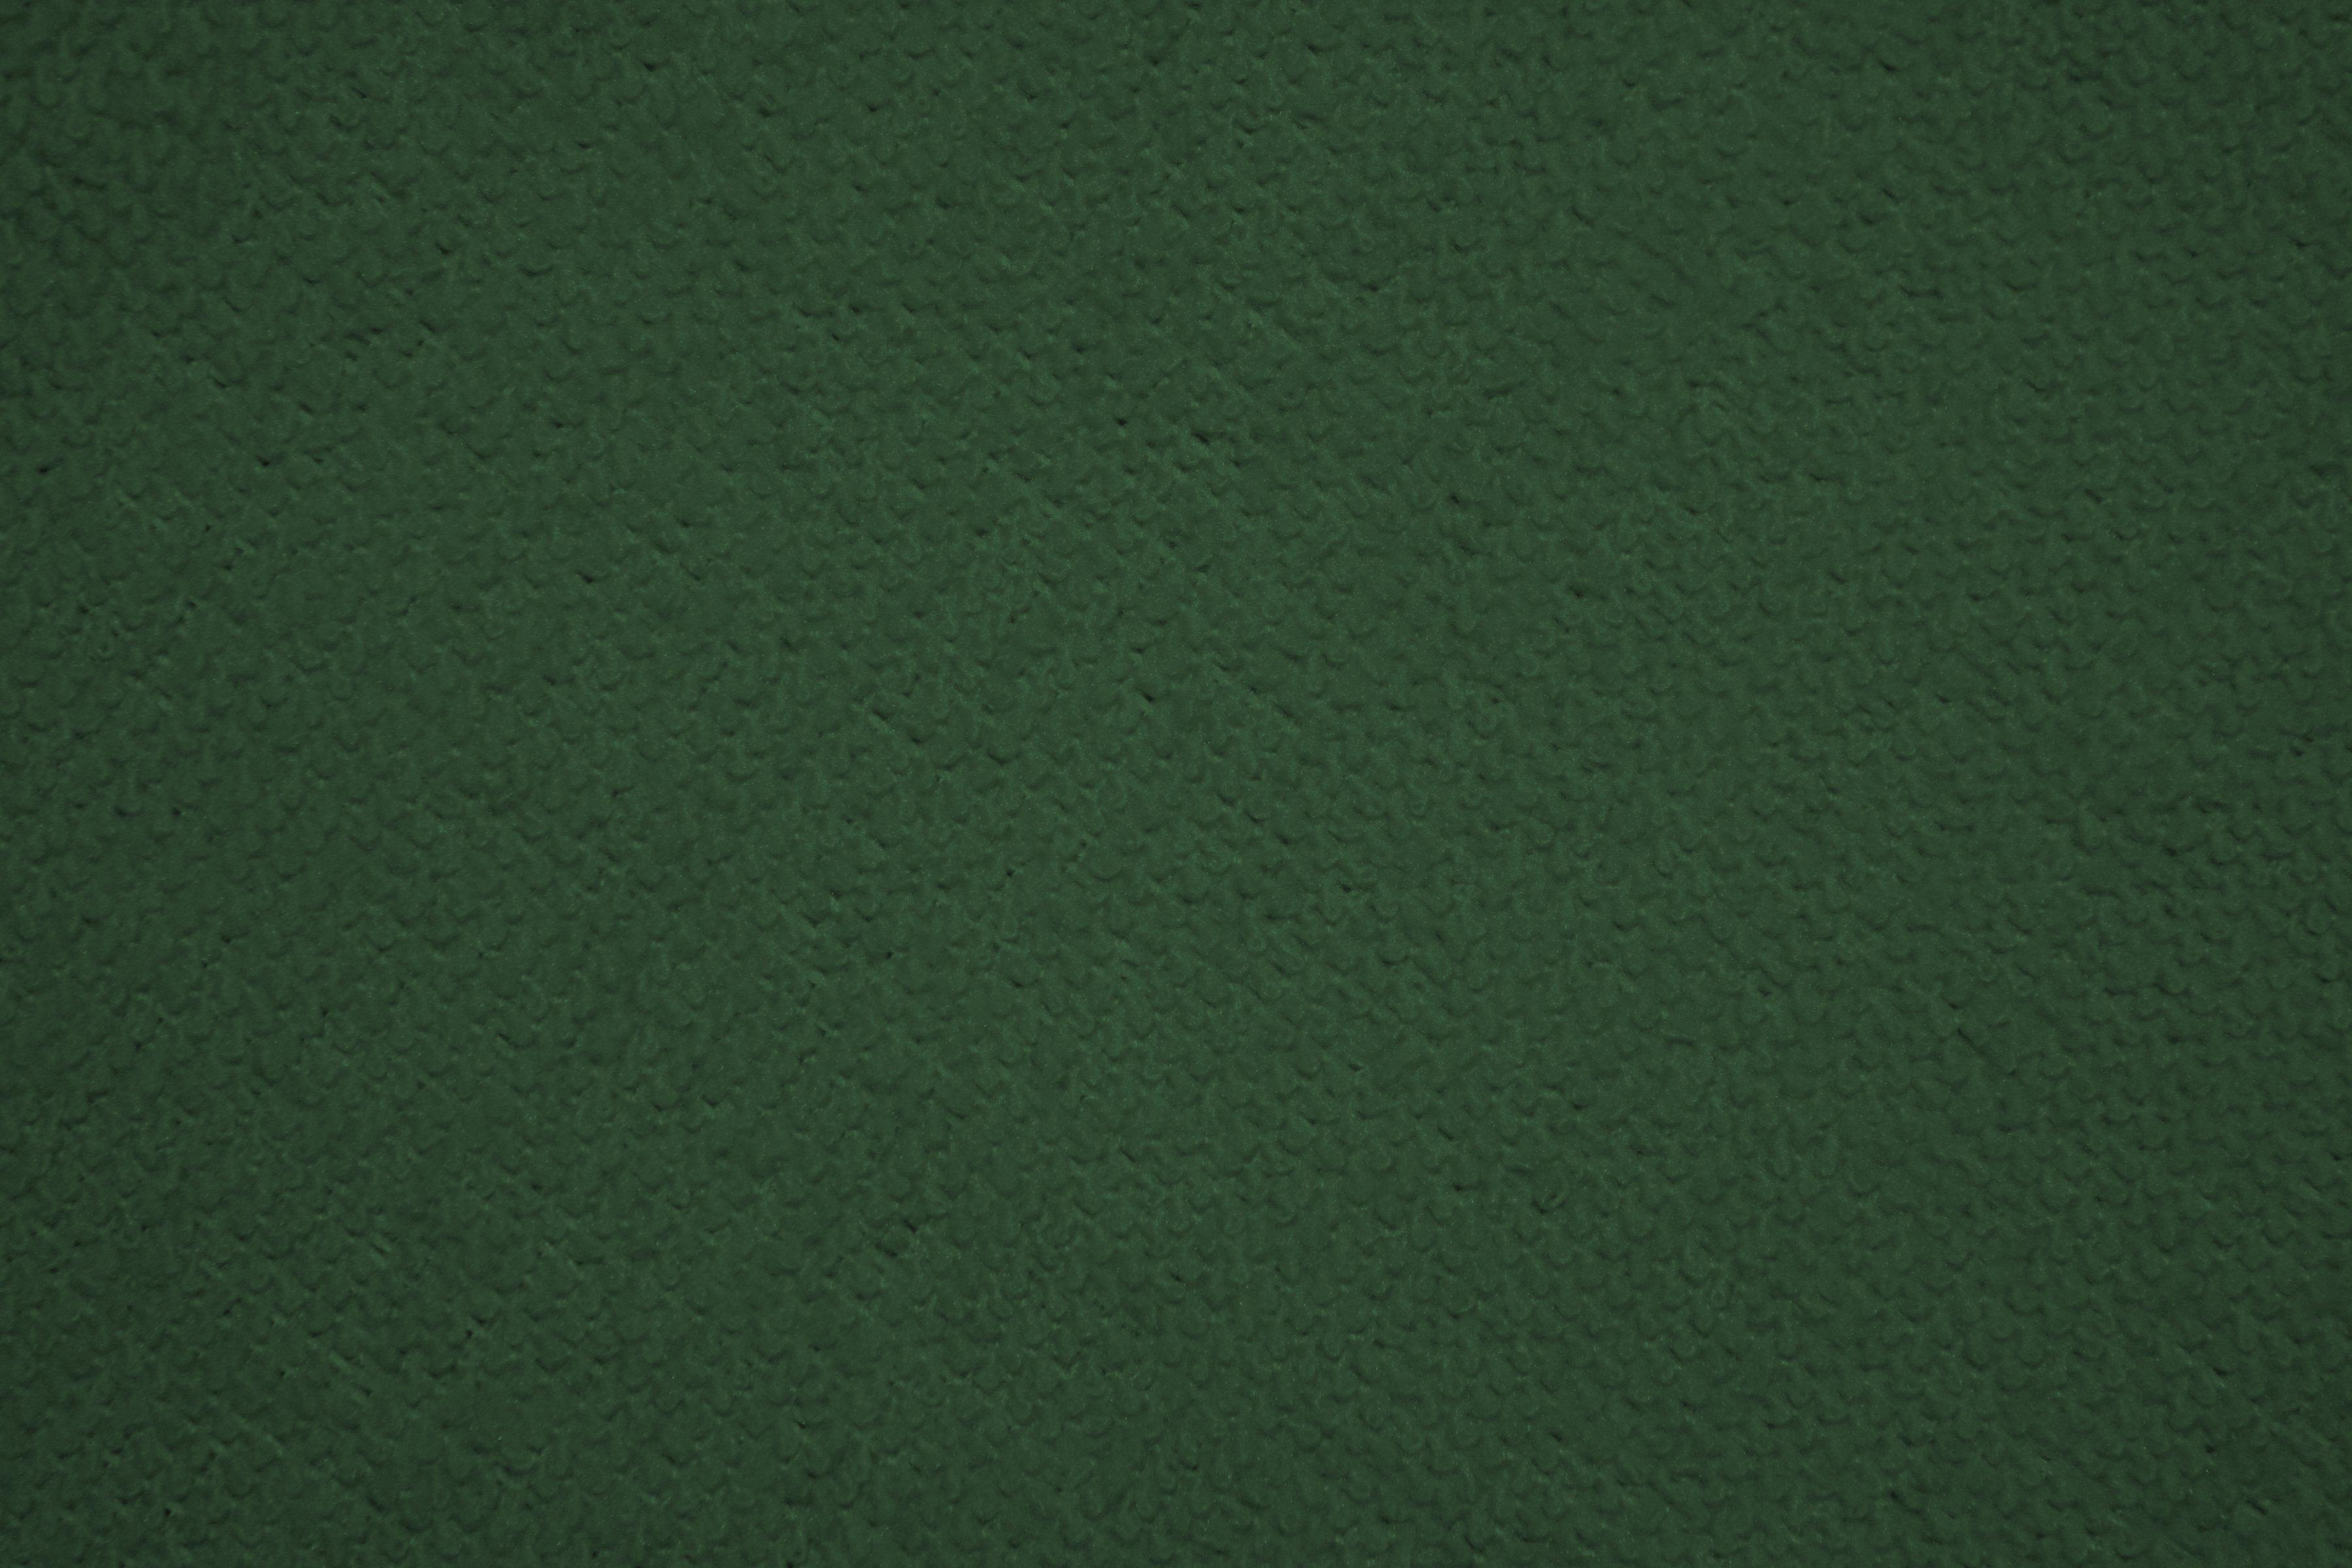 green metal